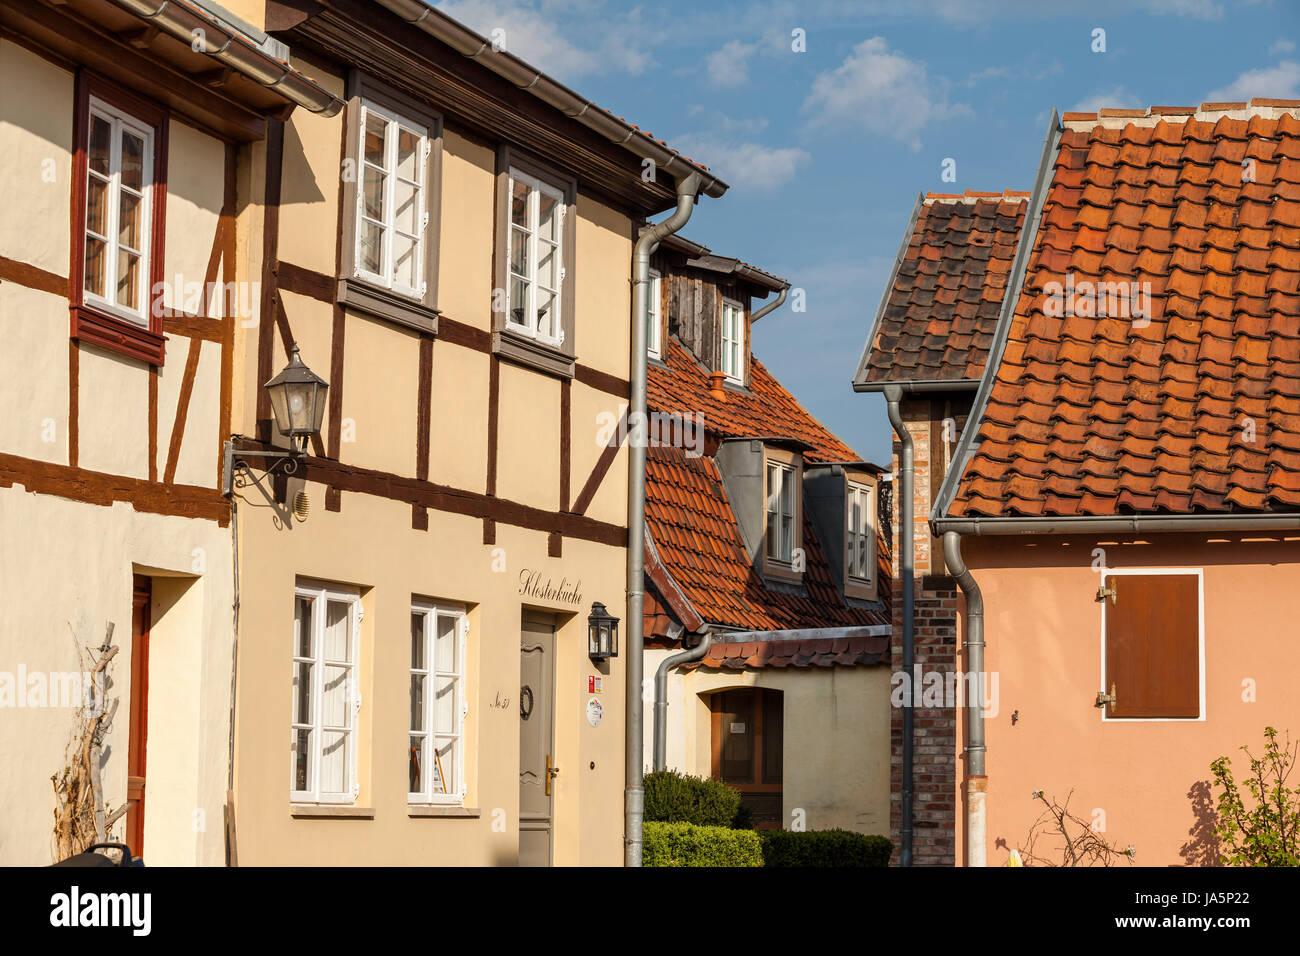 Mnzenberg Stockfotos & Mnzenberg Bilder - Alamy